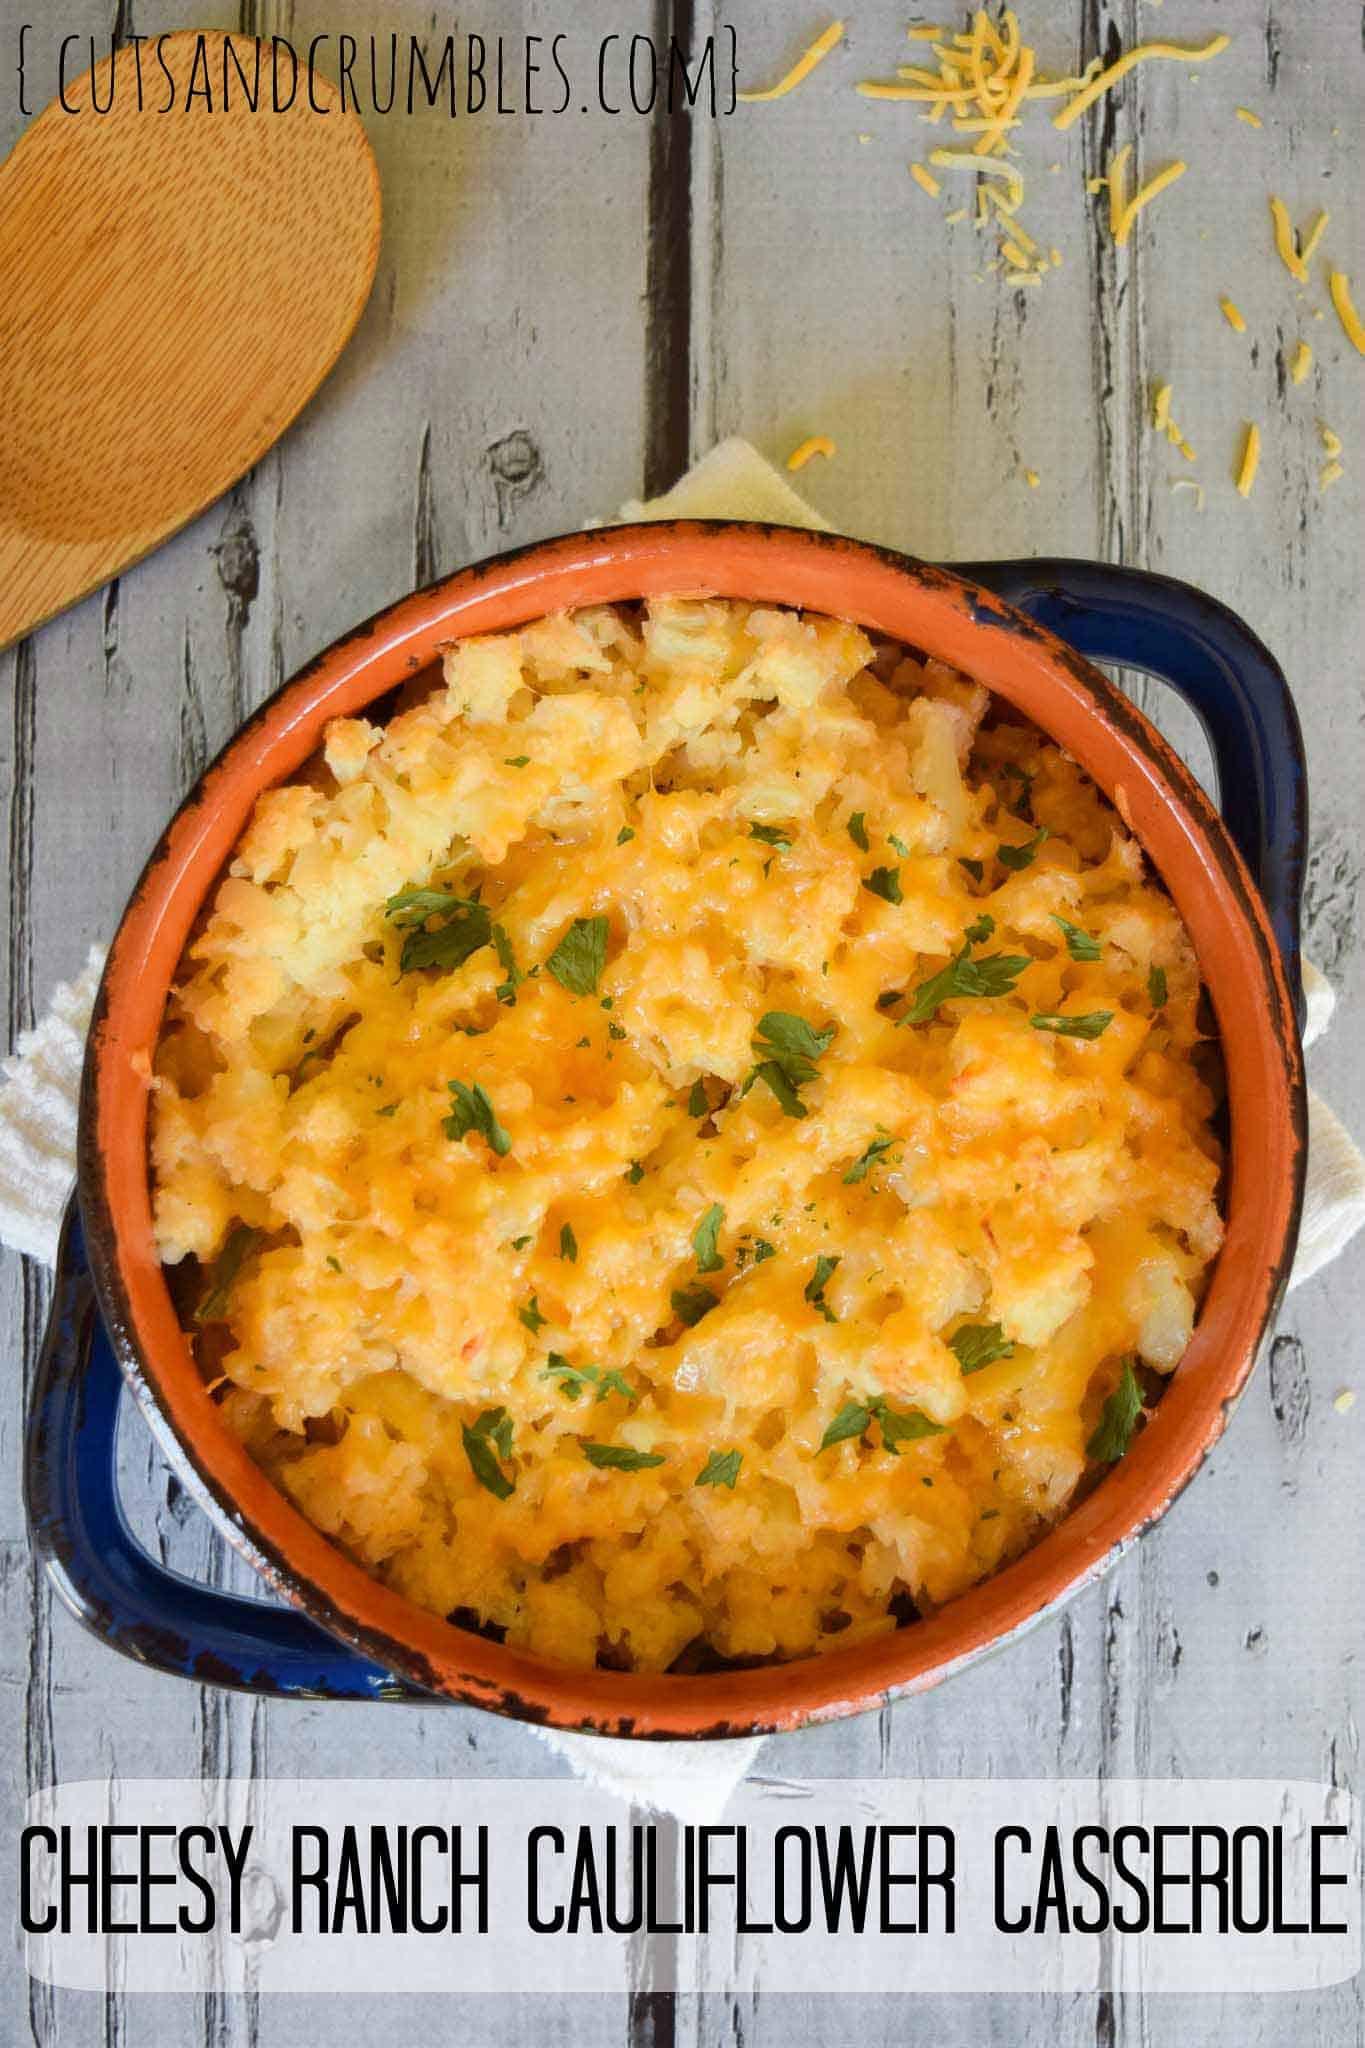 Cheesy Ranch Cauliflower Casserole